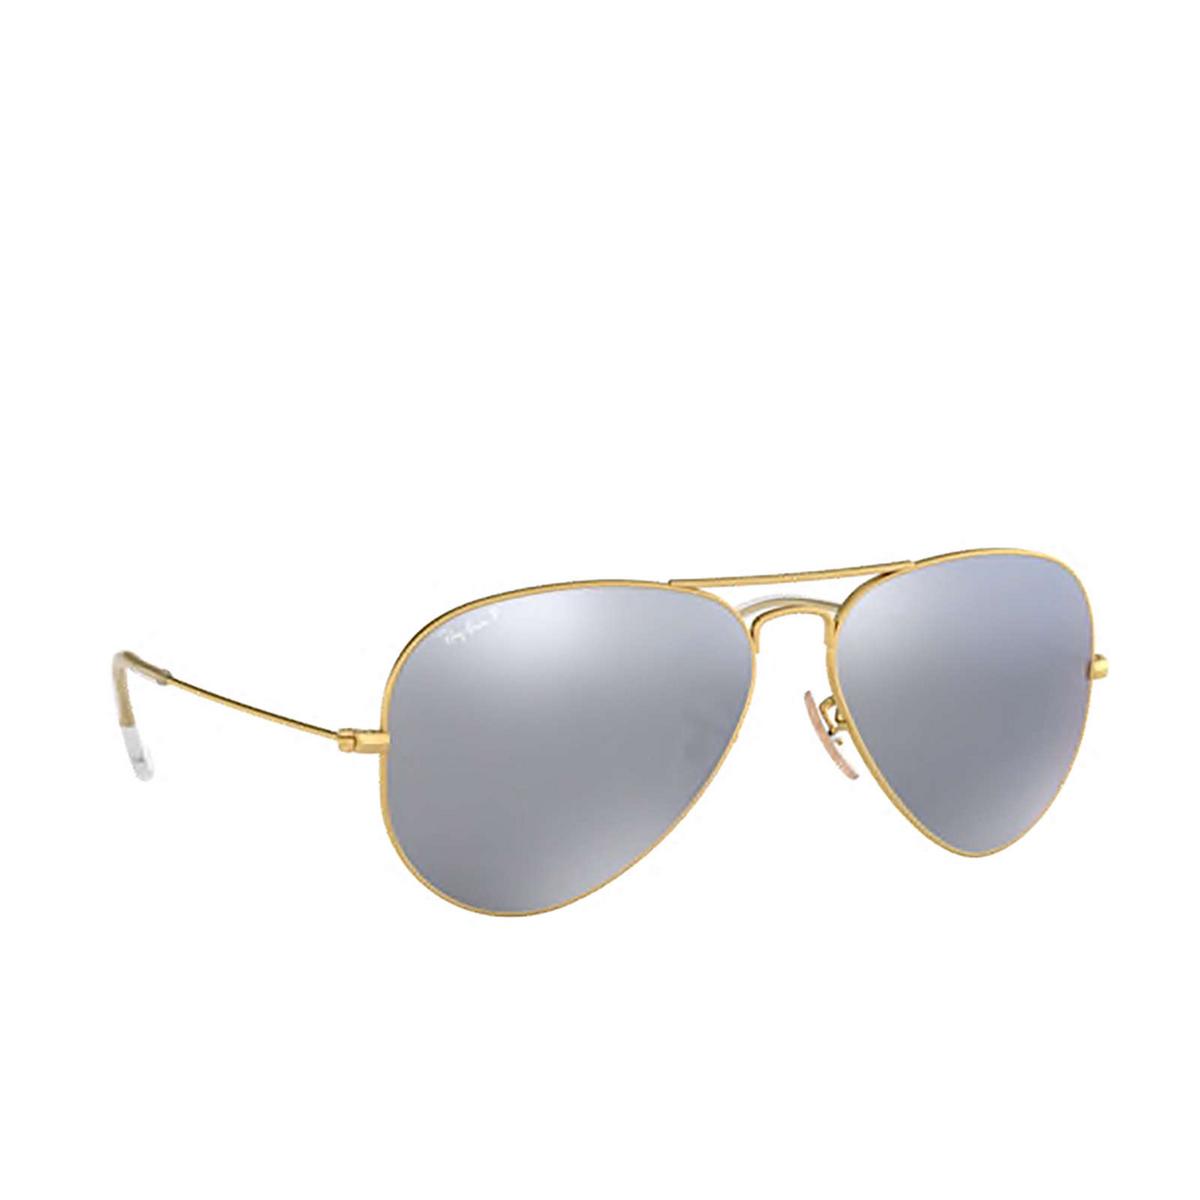 Ray-Ban® Aviator Sunglasses: Aviator Large Metal RB3025 color Matte Arista 112/W3 - three-quarters view.